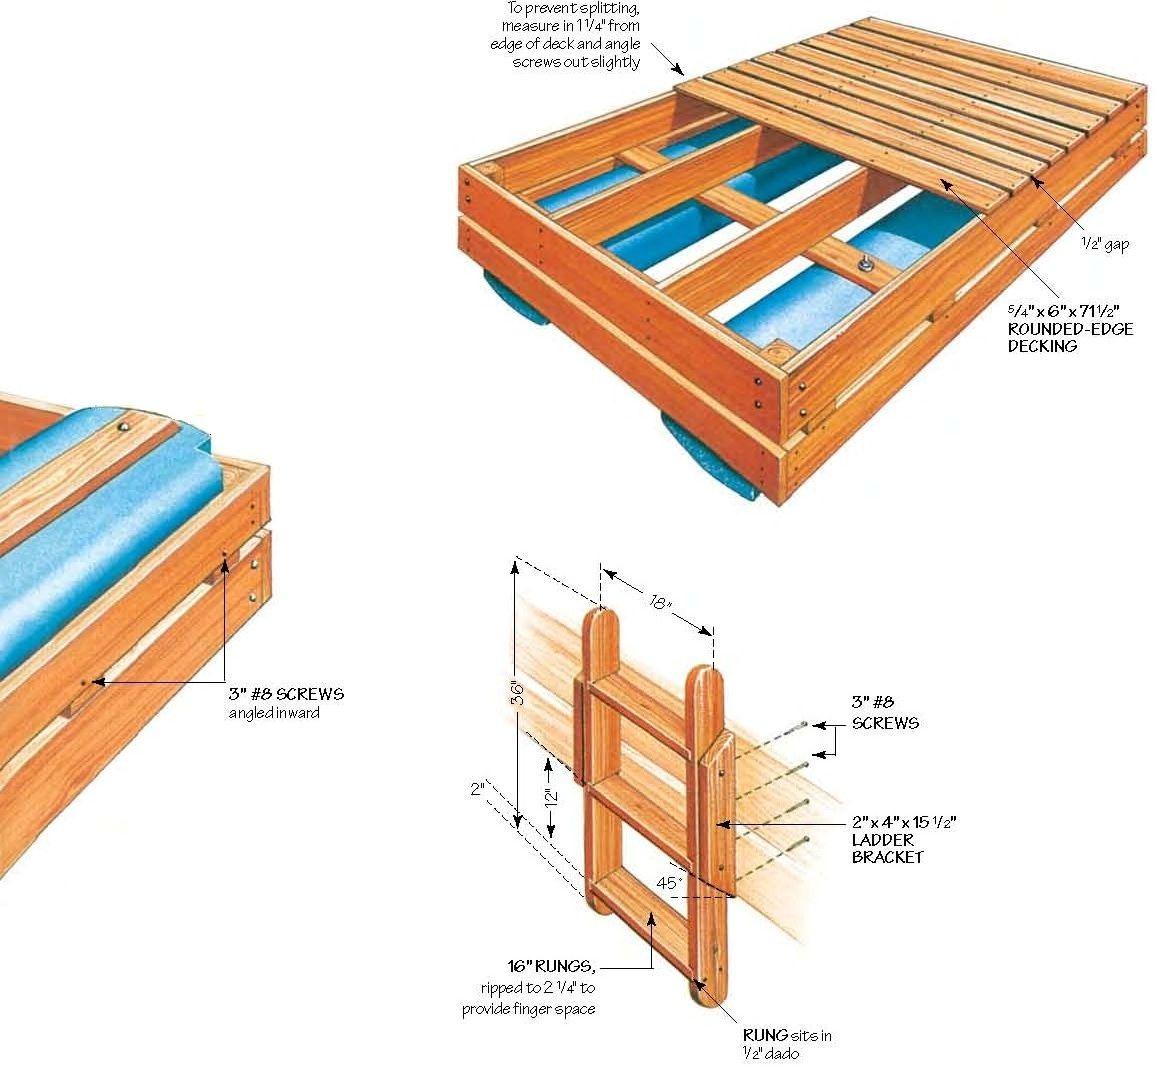 Free swim raft wood plans diy pinterest wood plans for Pool platform ideas